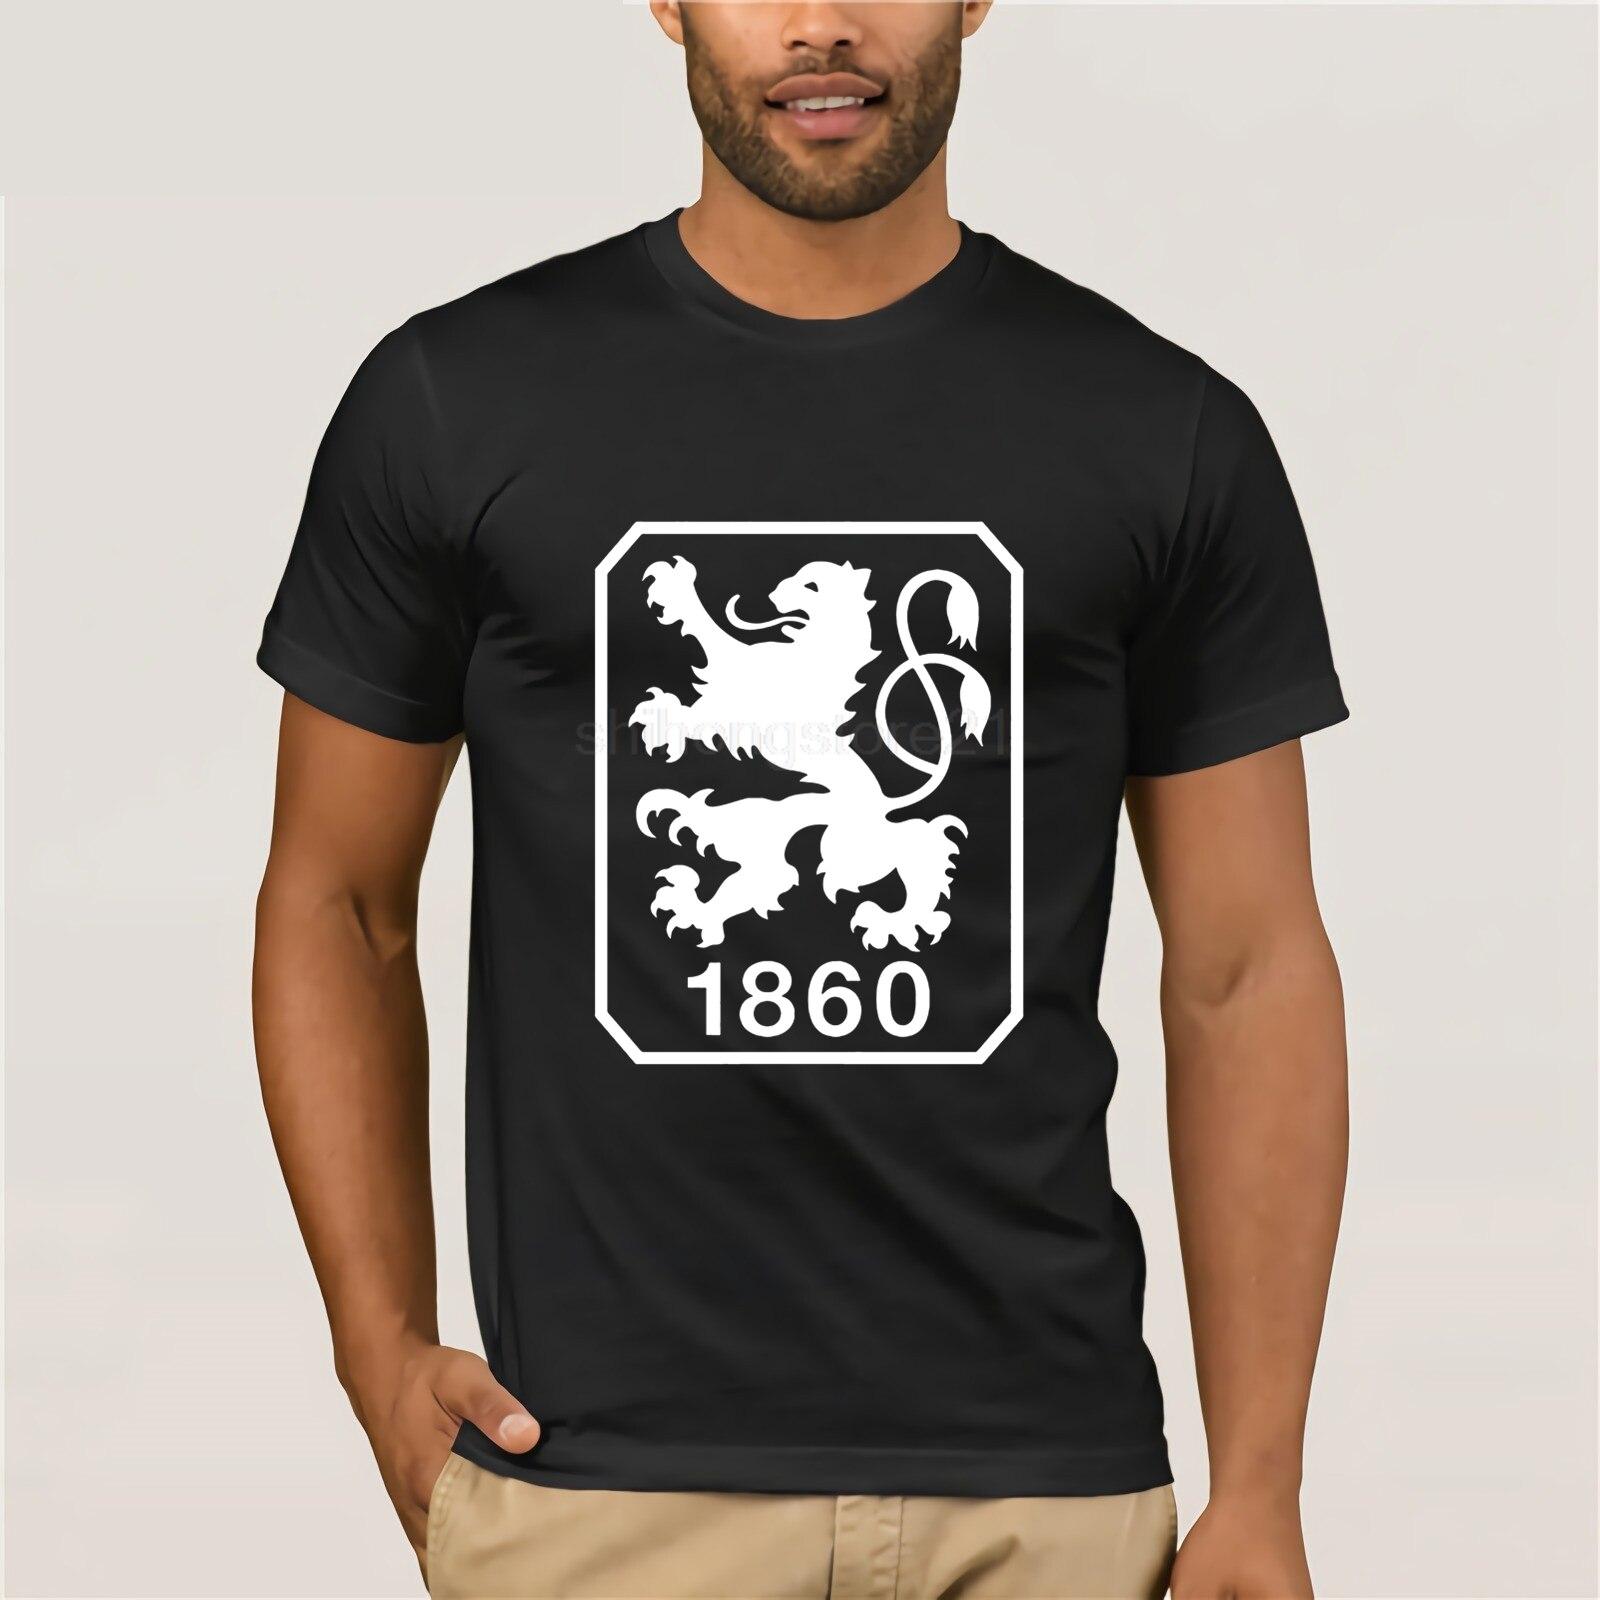 TSV 1860 Munchen Alemania negro blanco Camisetas Camiseta corta DE b Allianz Arena Daniel Bierofka Michael Liendl Camiseta (114)